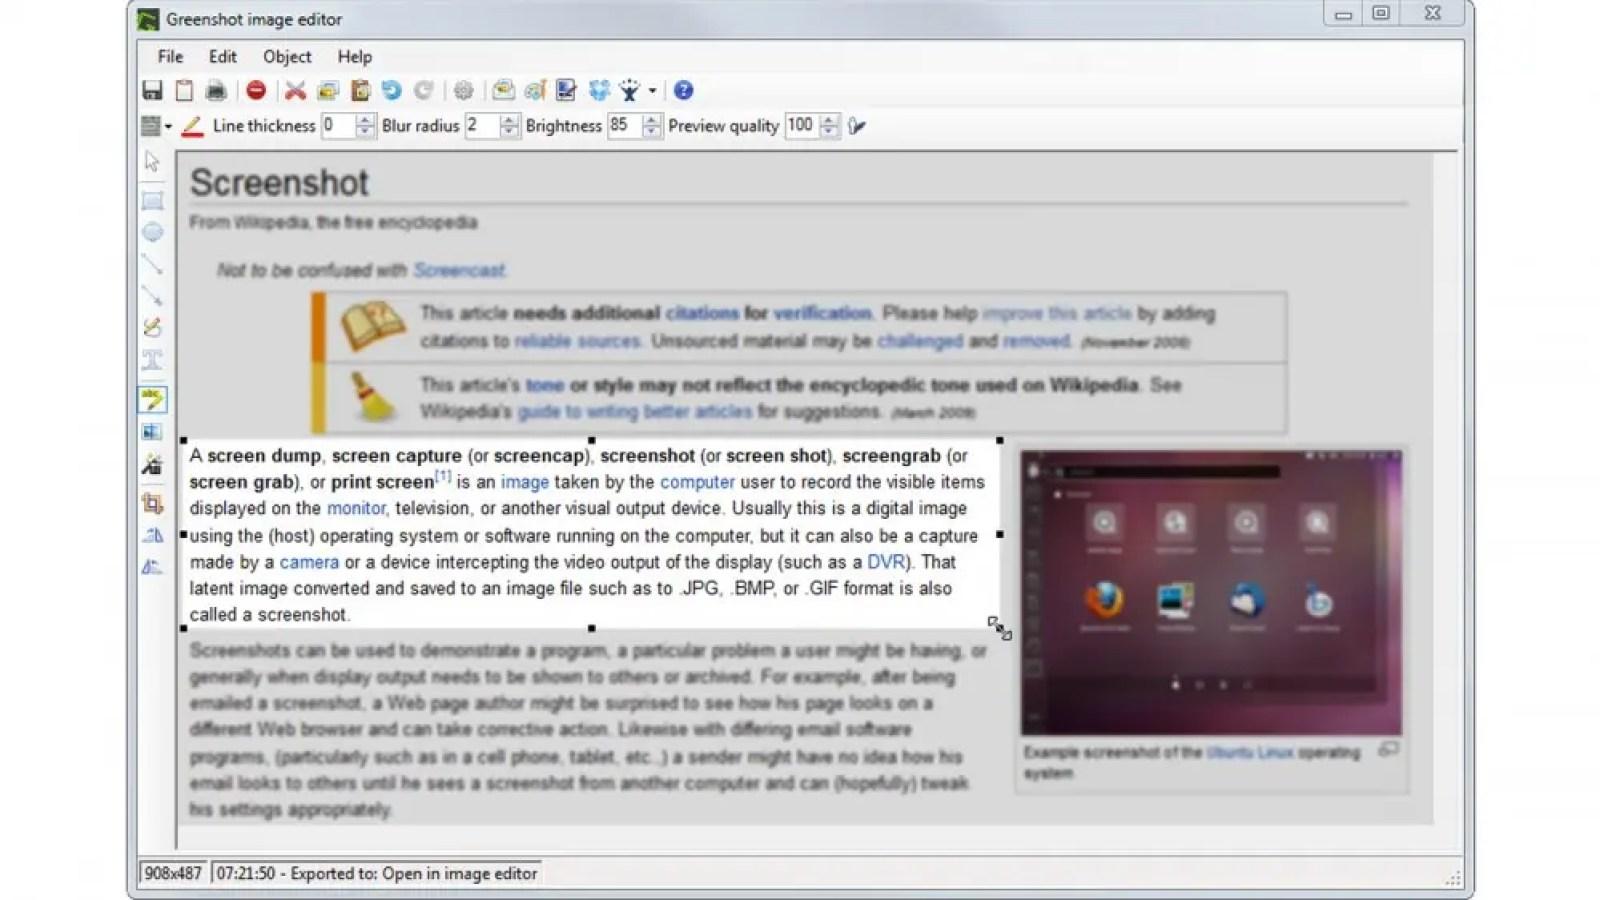 Greenshot free open-source screenshot tool capturing part of a web article